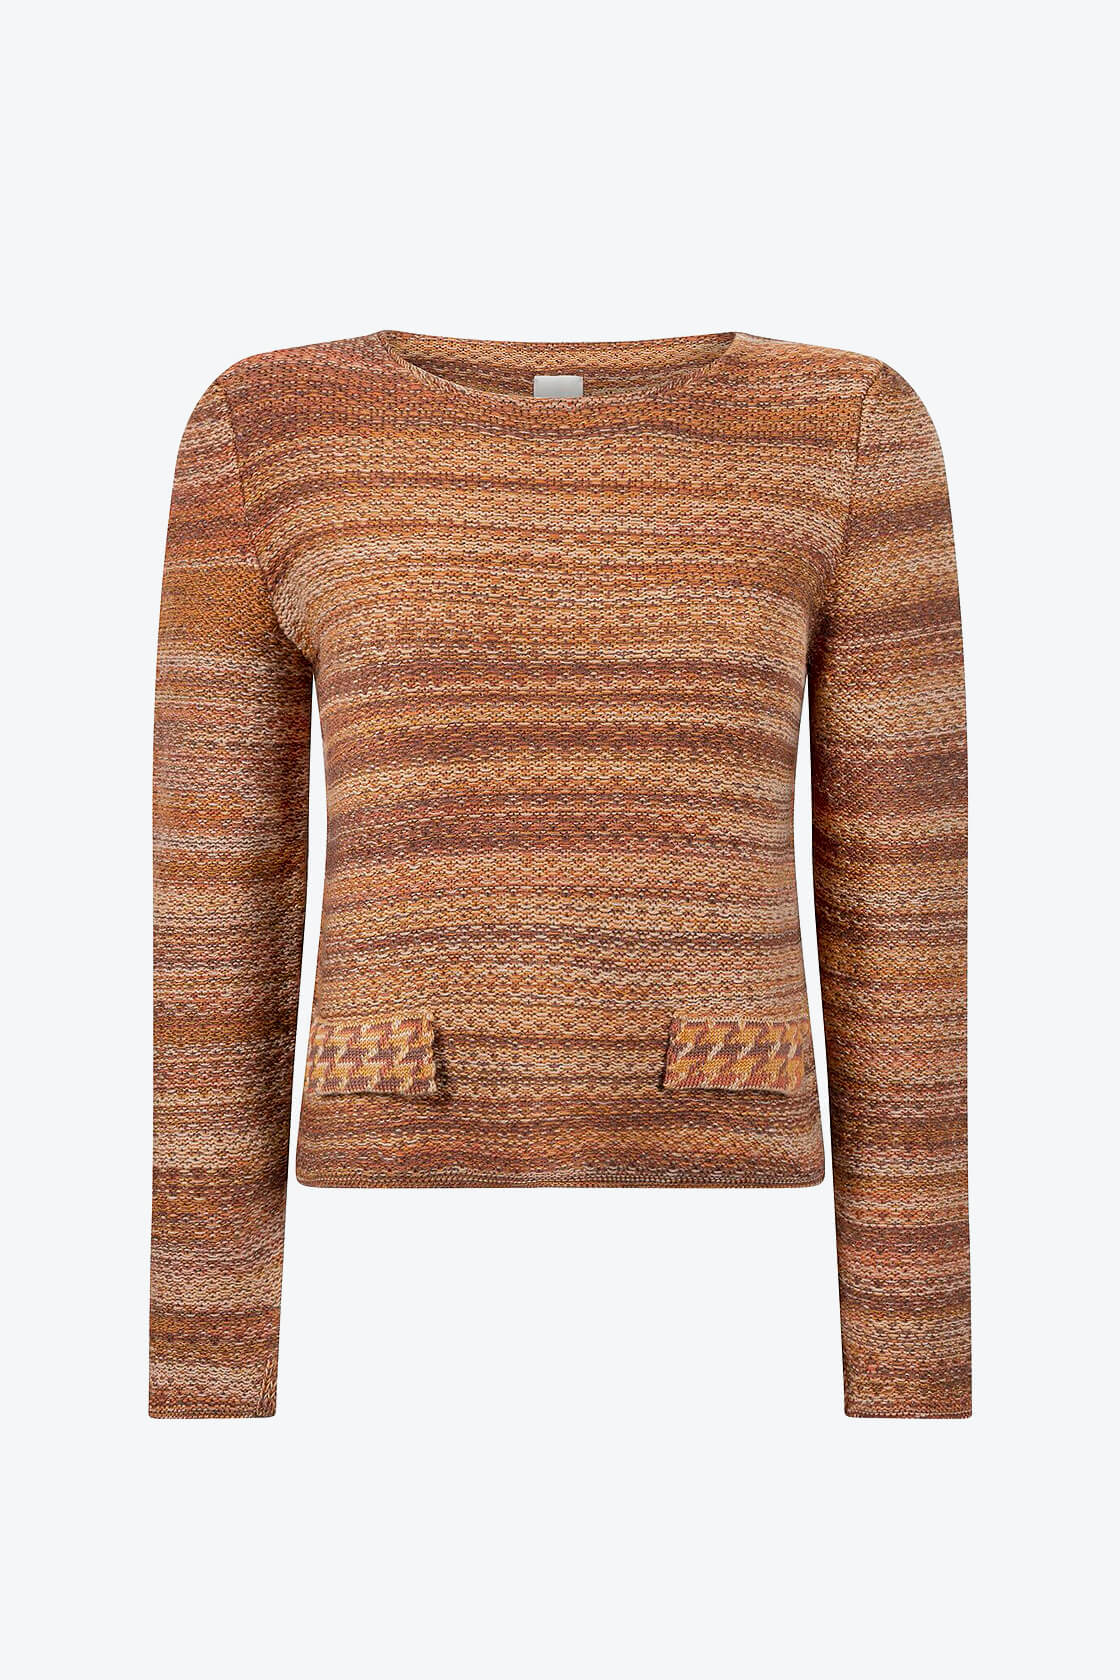 Elegant Knitted Jumper In Audrey Hepburn Style Tweed Ginger